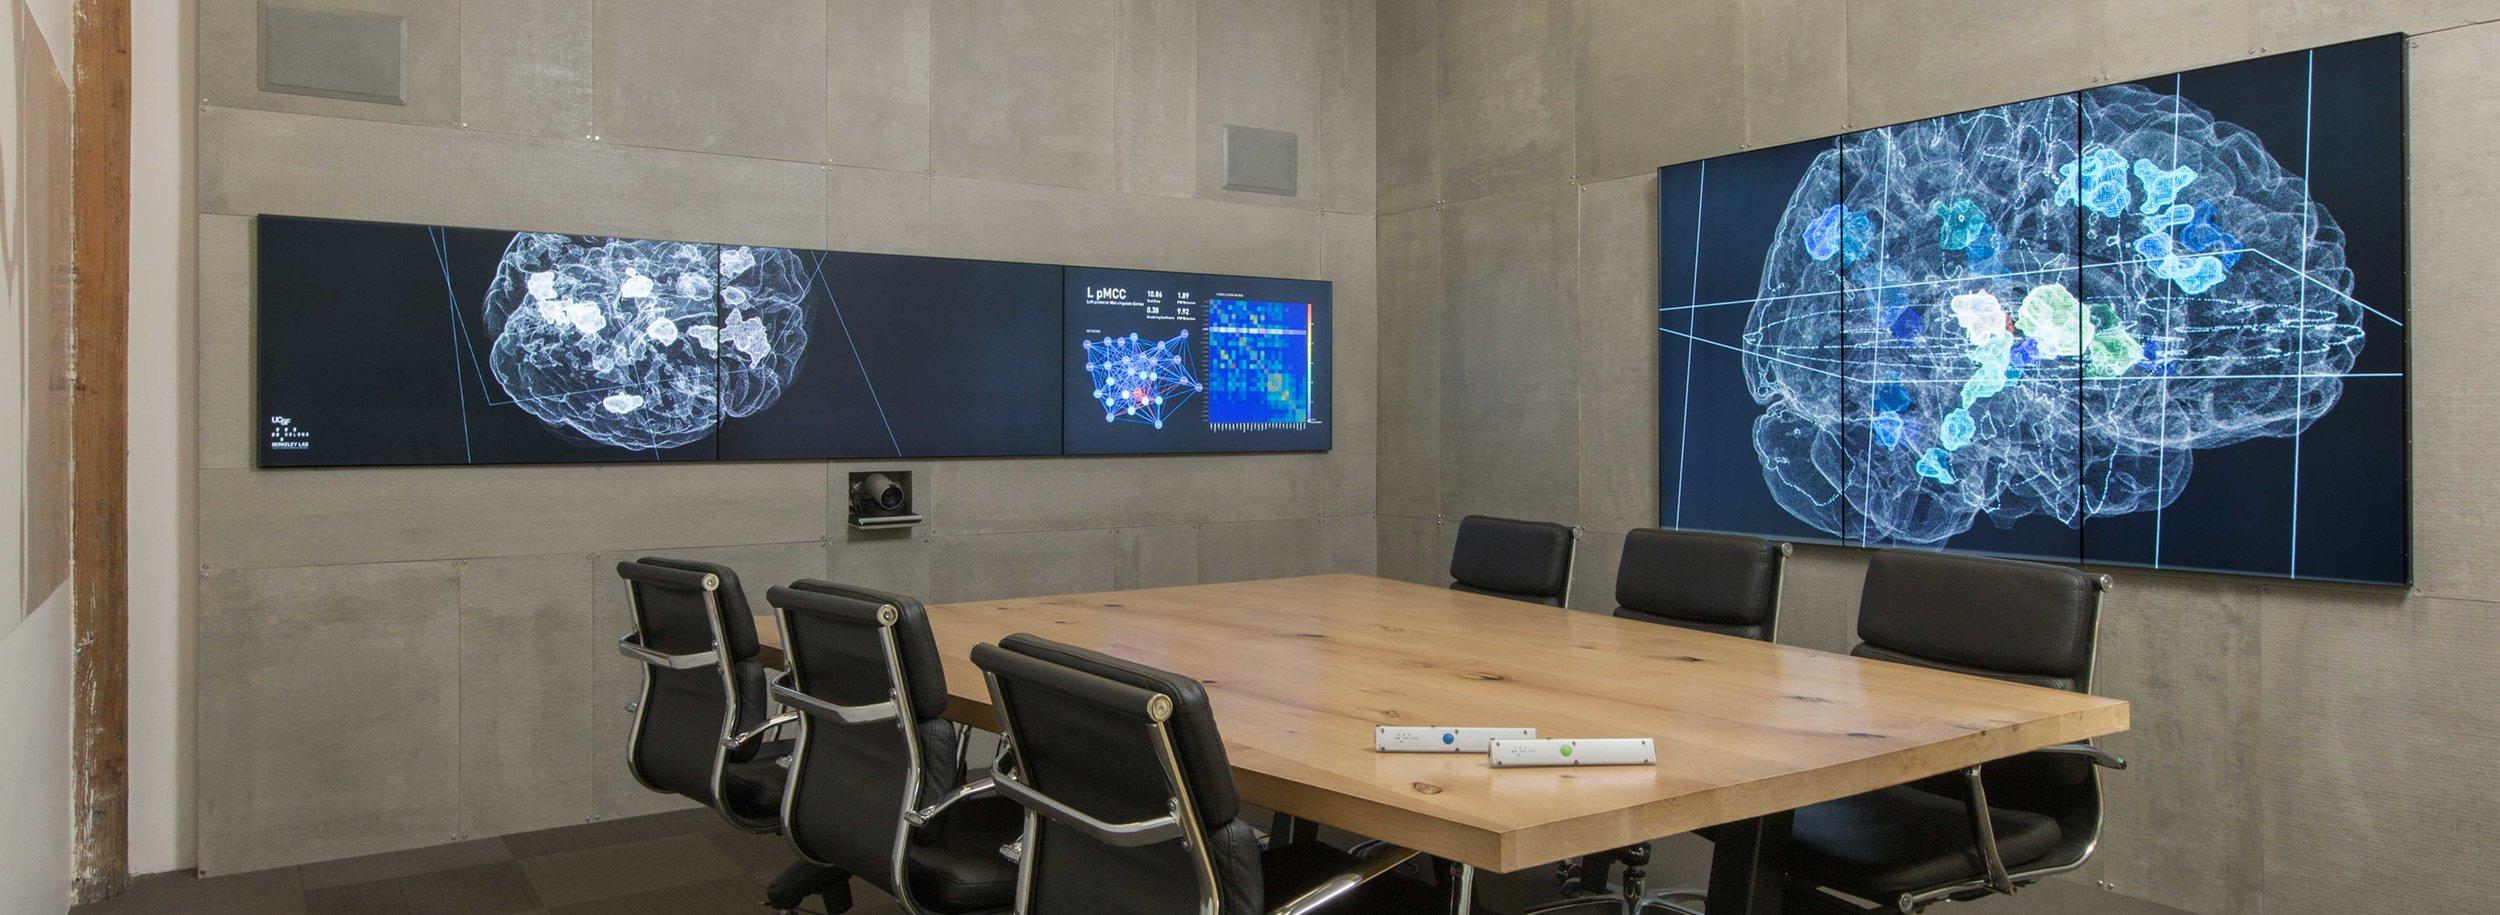 Studio HHH_Oblong Conference Room_1.jpg